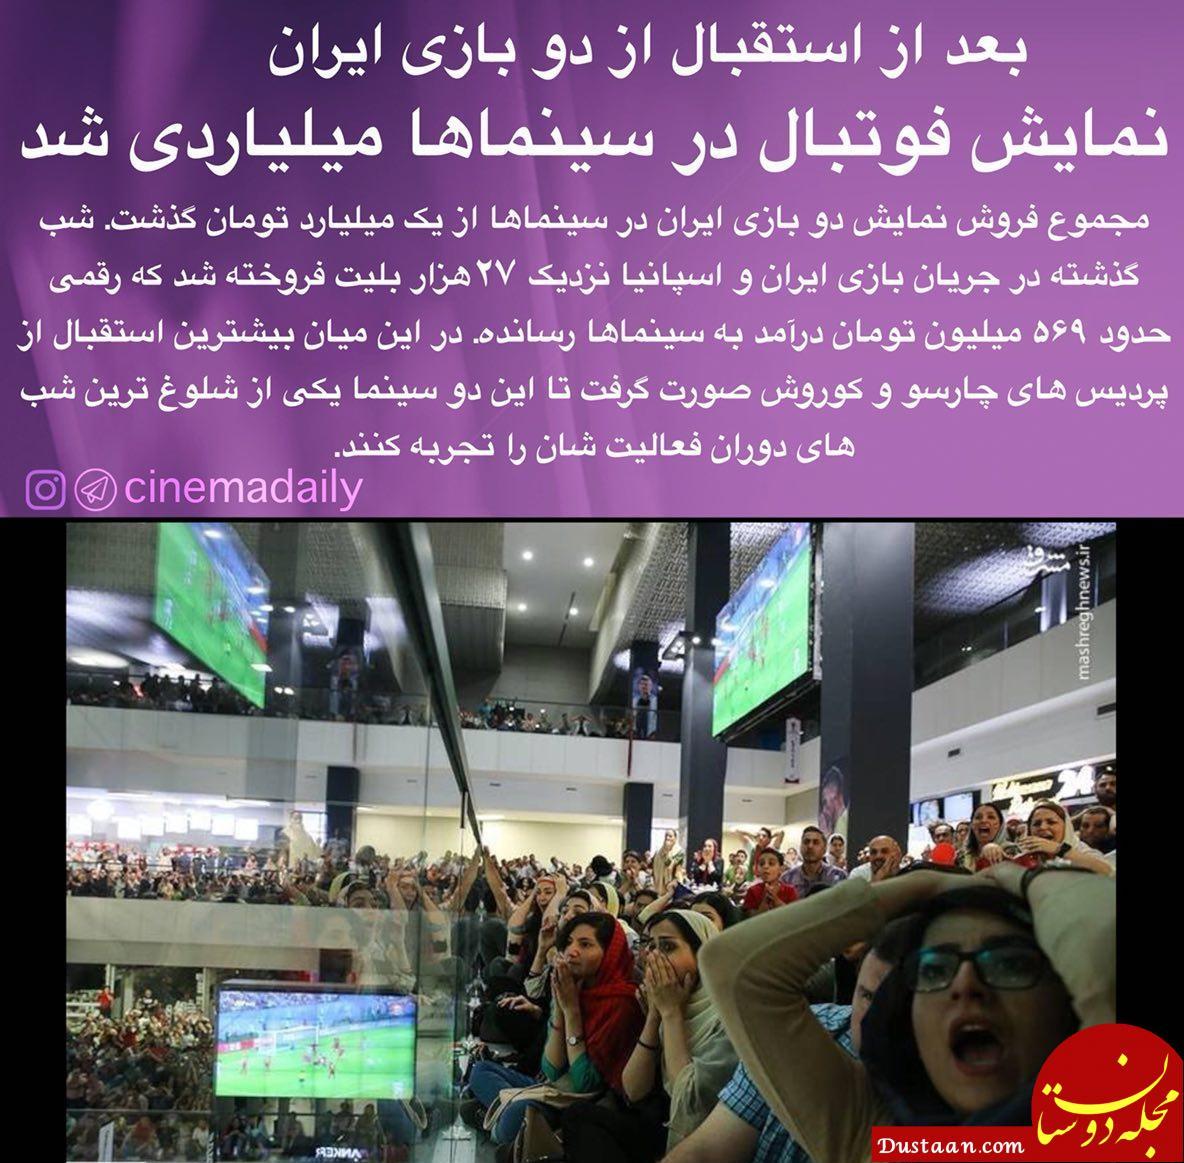 www.dustaan.com یک میلیارد تومان فروش دو بازی ایران در سینماها